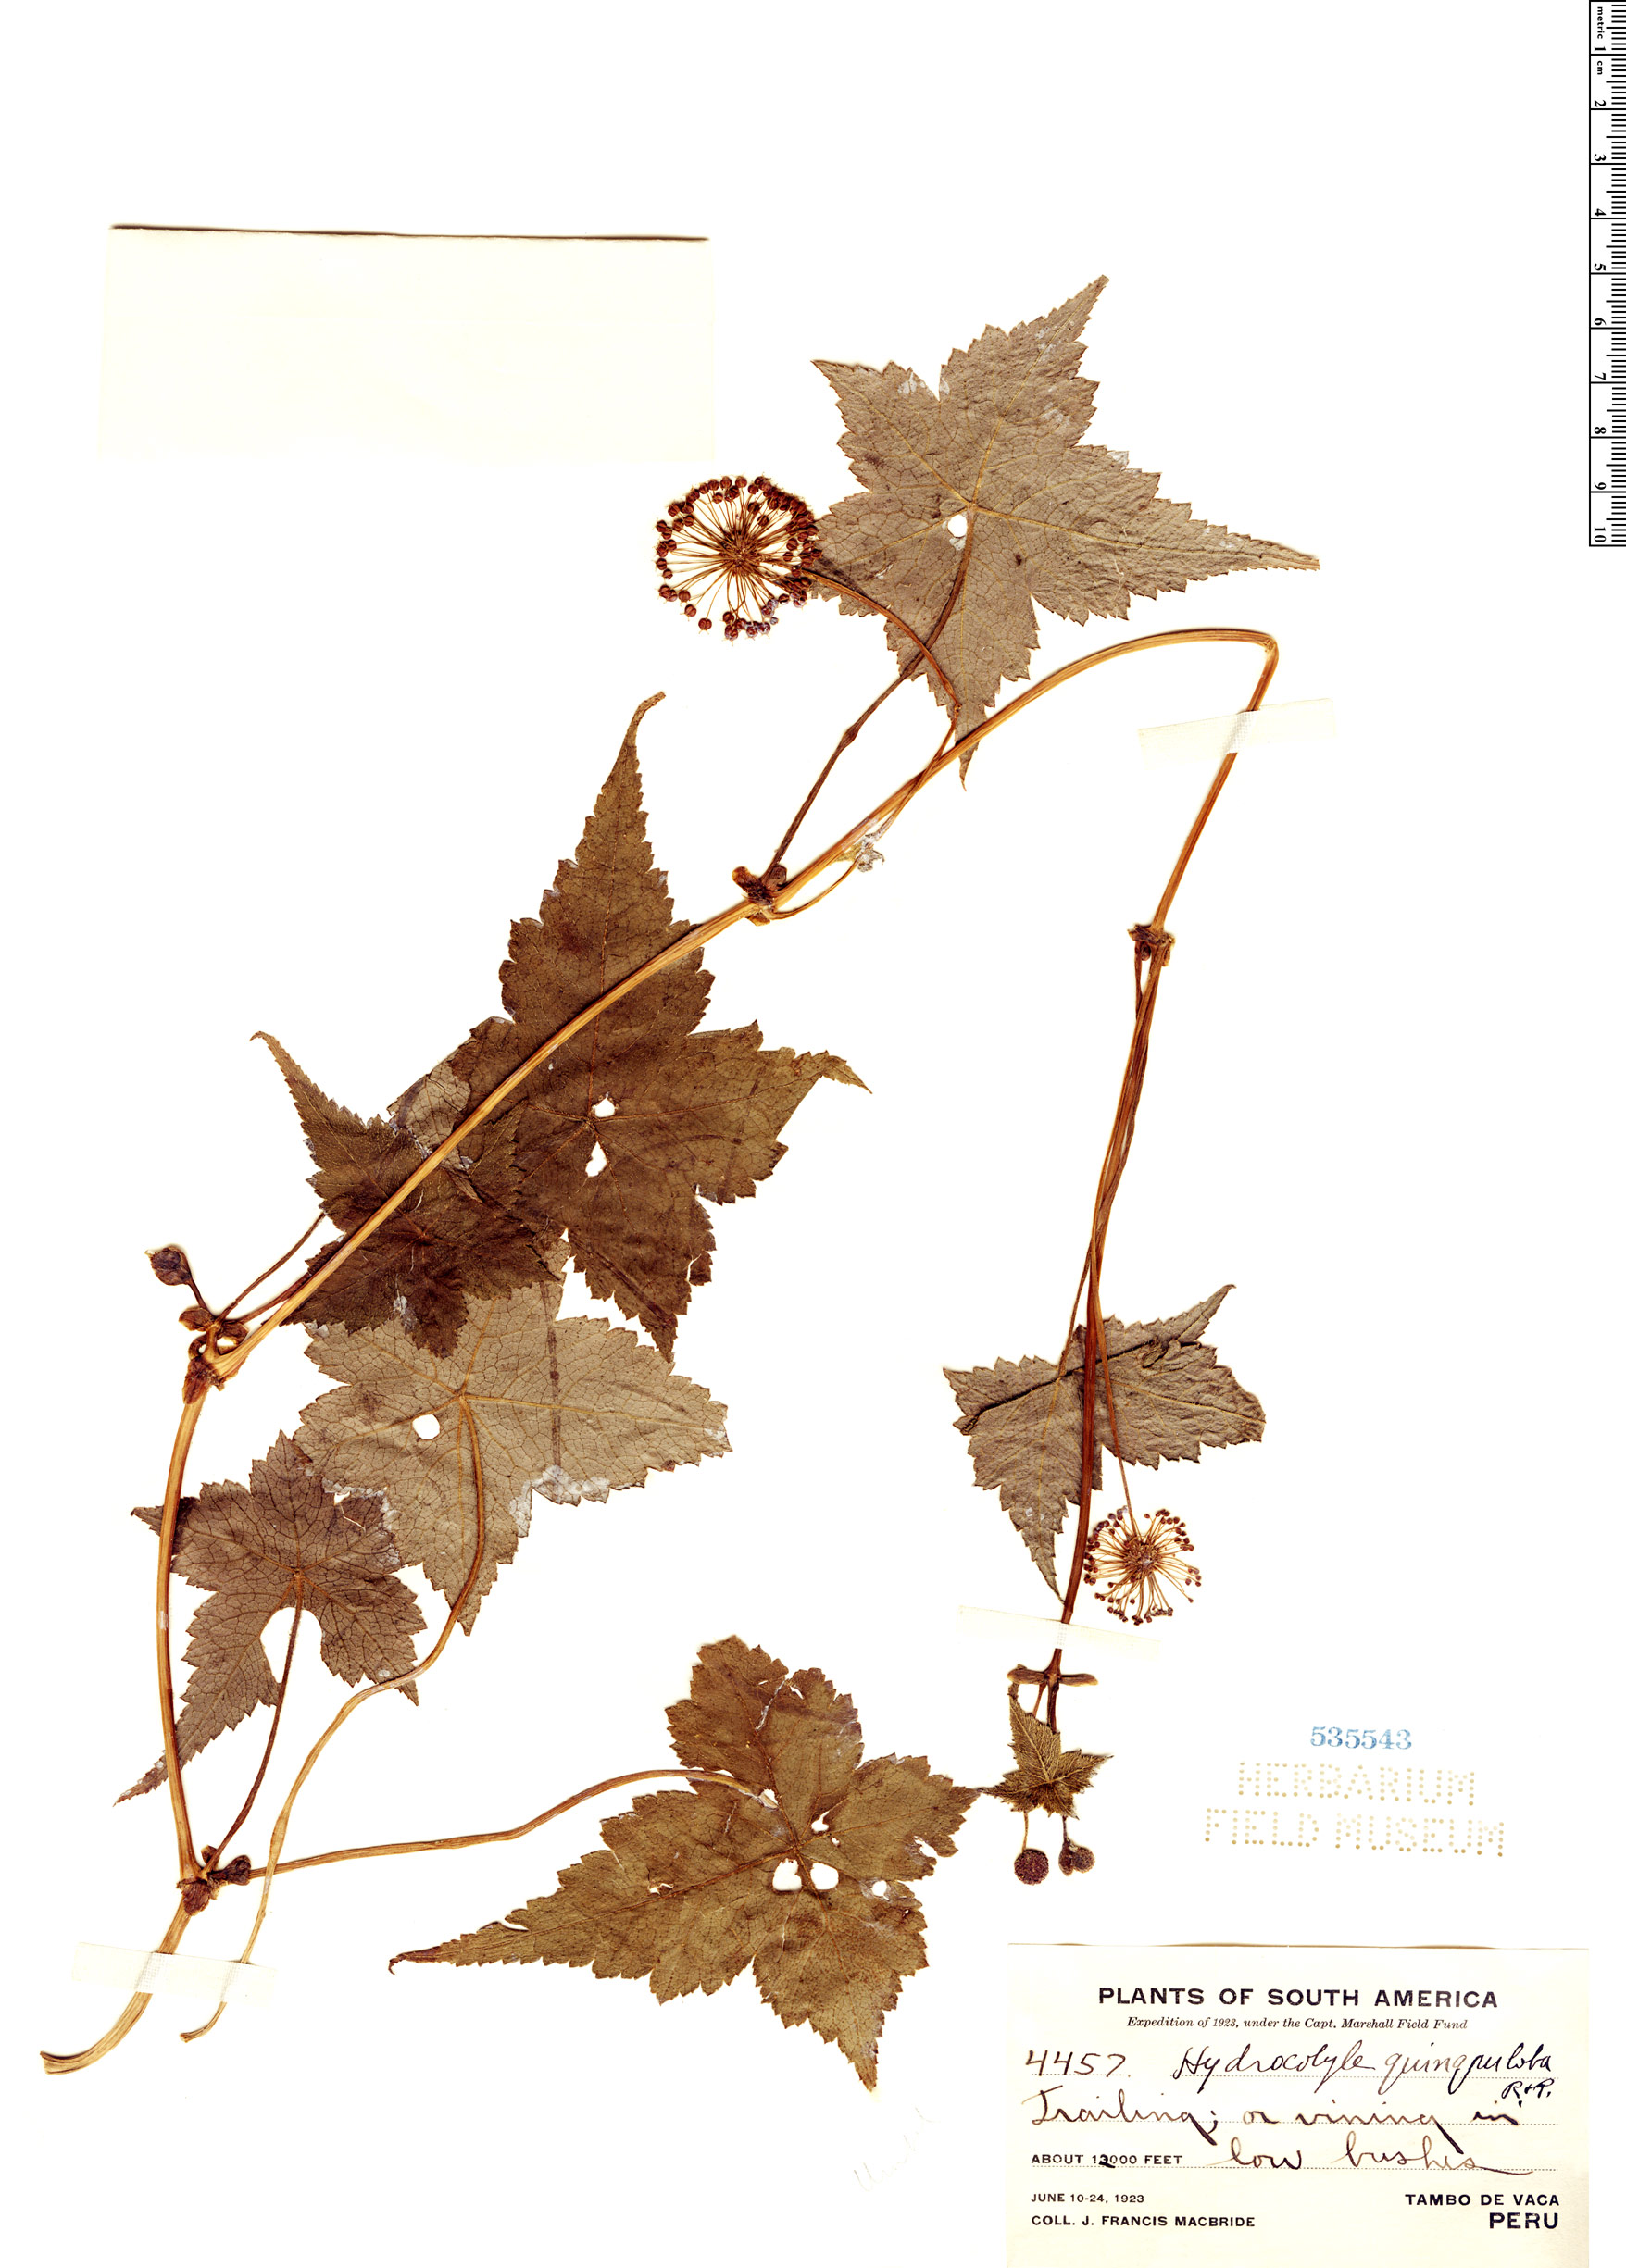 Espécimen: Hydrocotyle quinqueloba